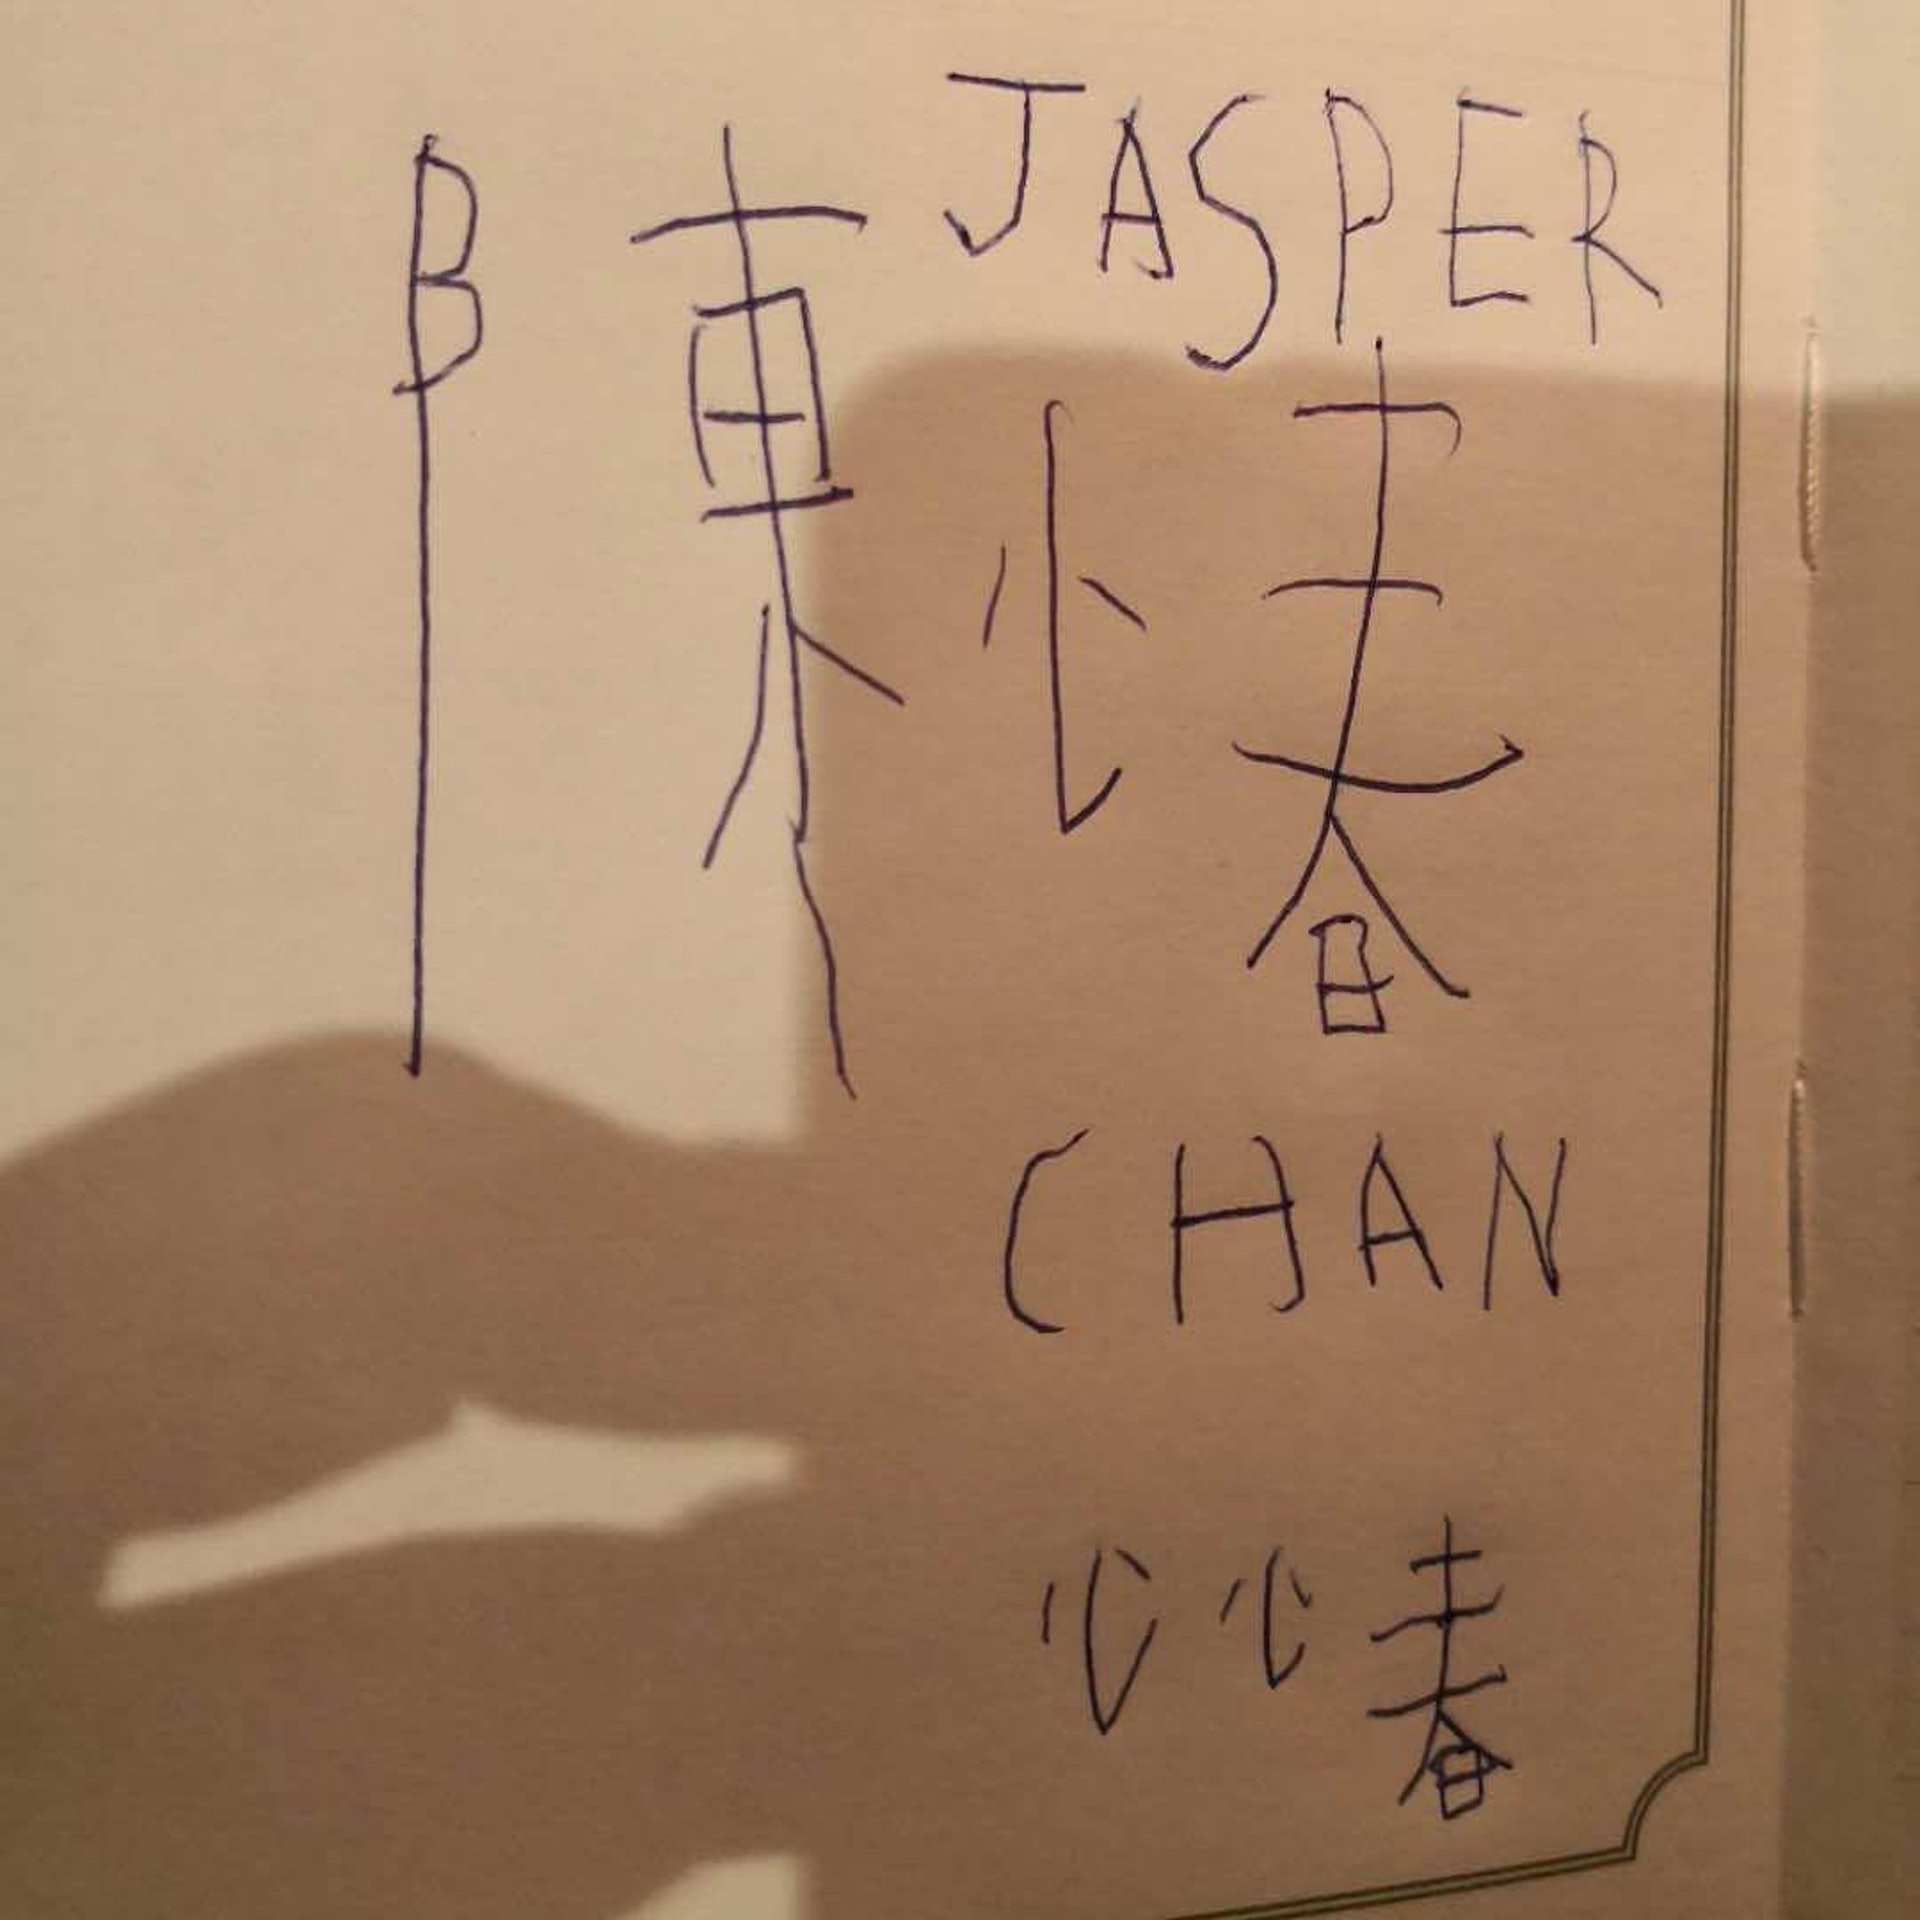 Jasper寫錯個「小」同「J」盡顯童趣可愛一面 陳小春:知足